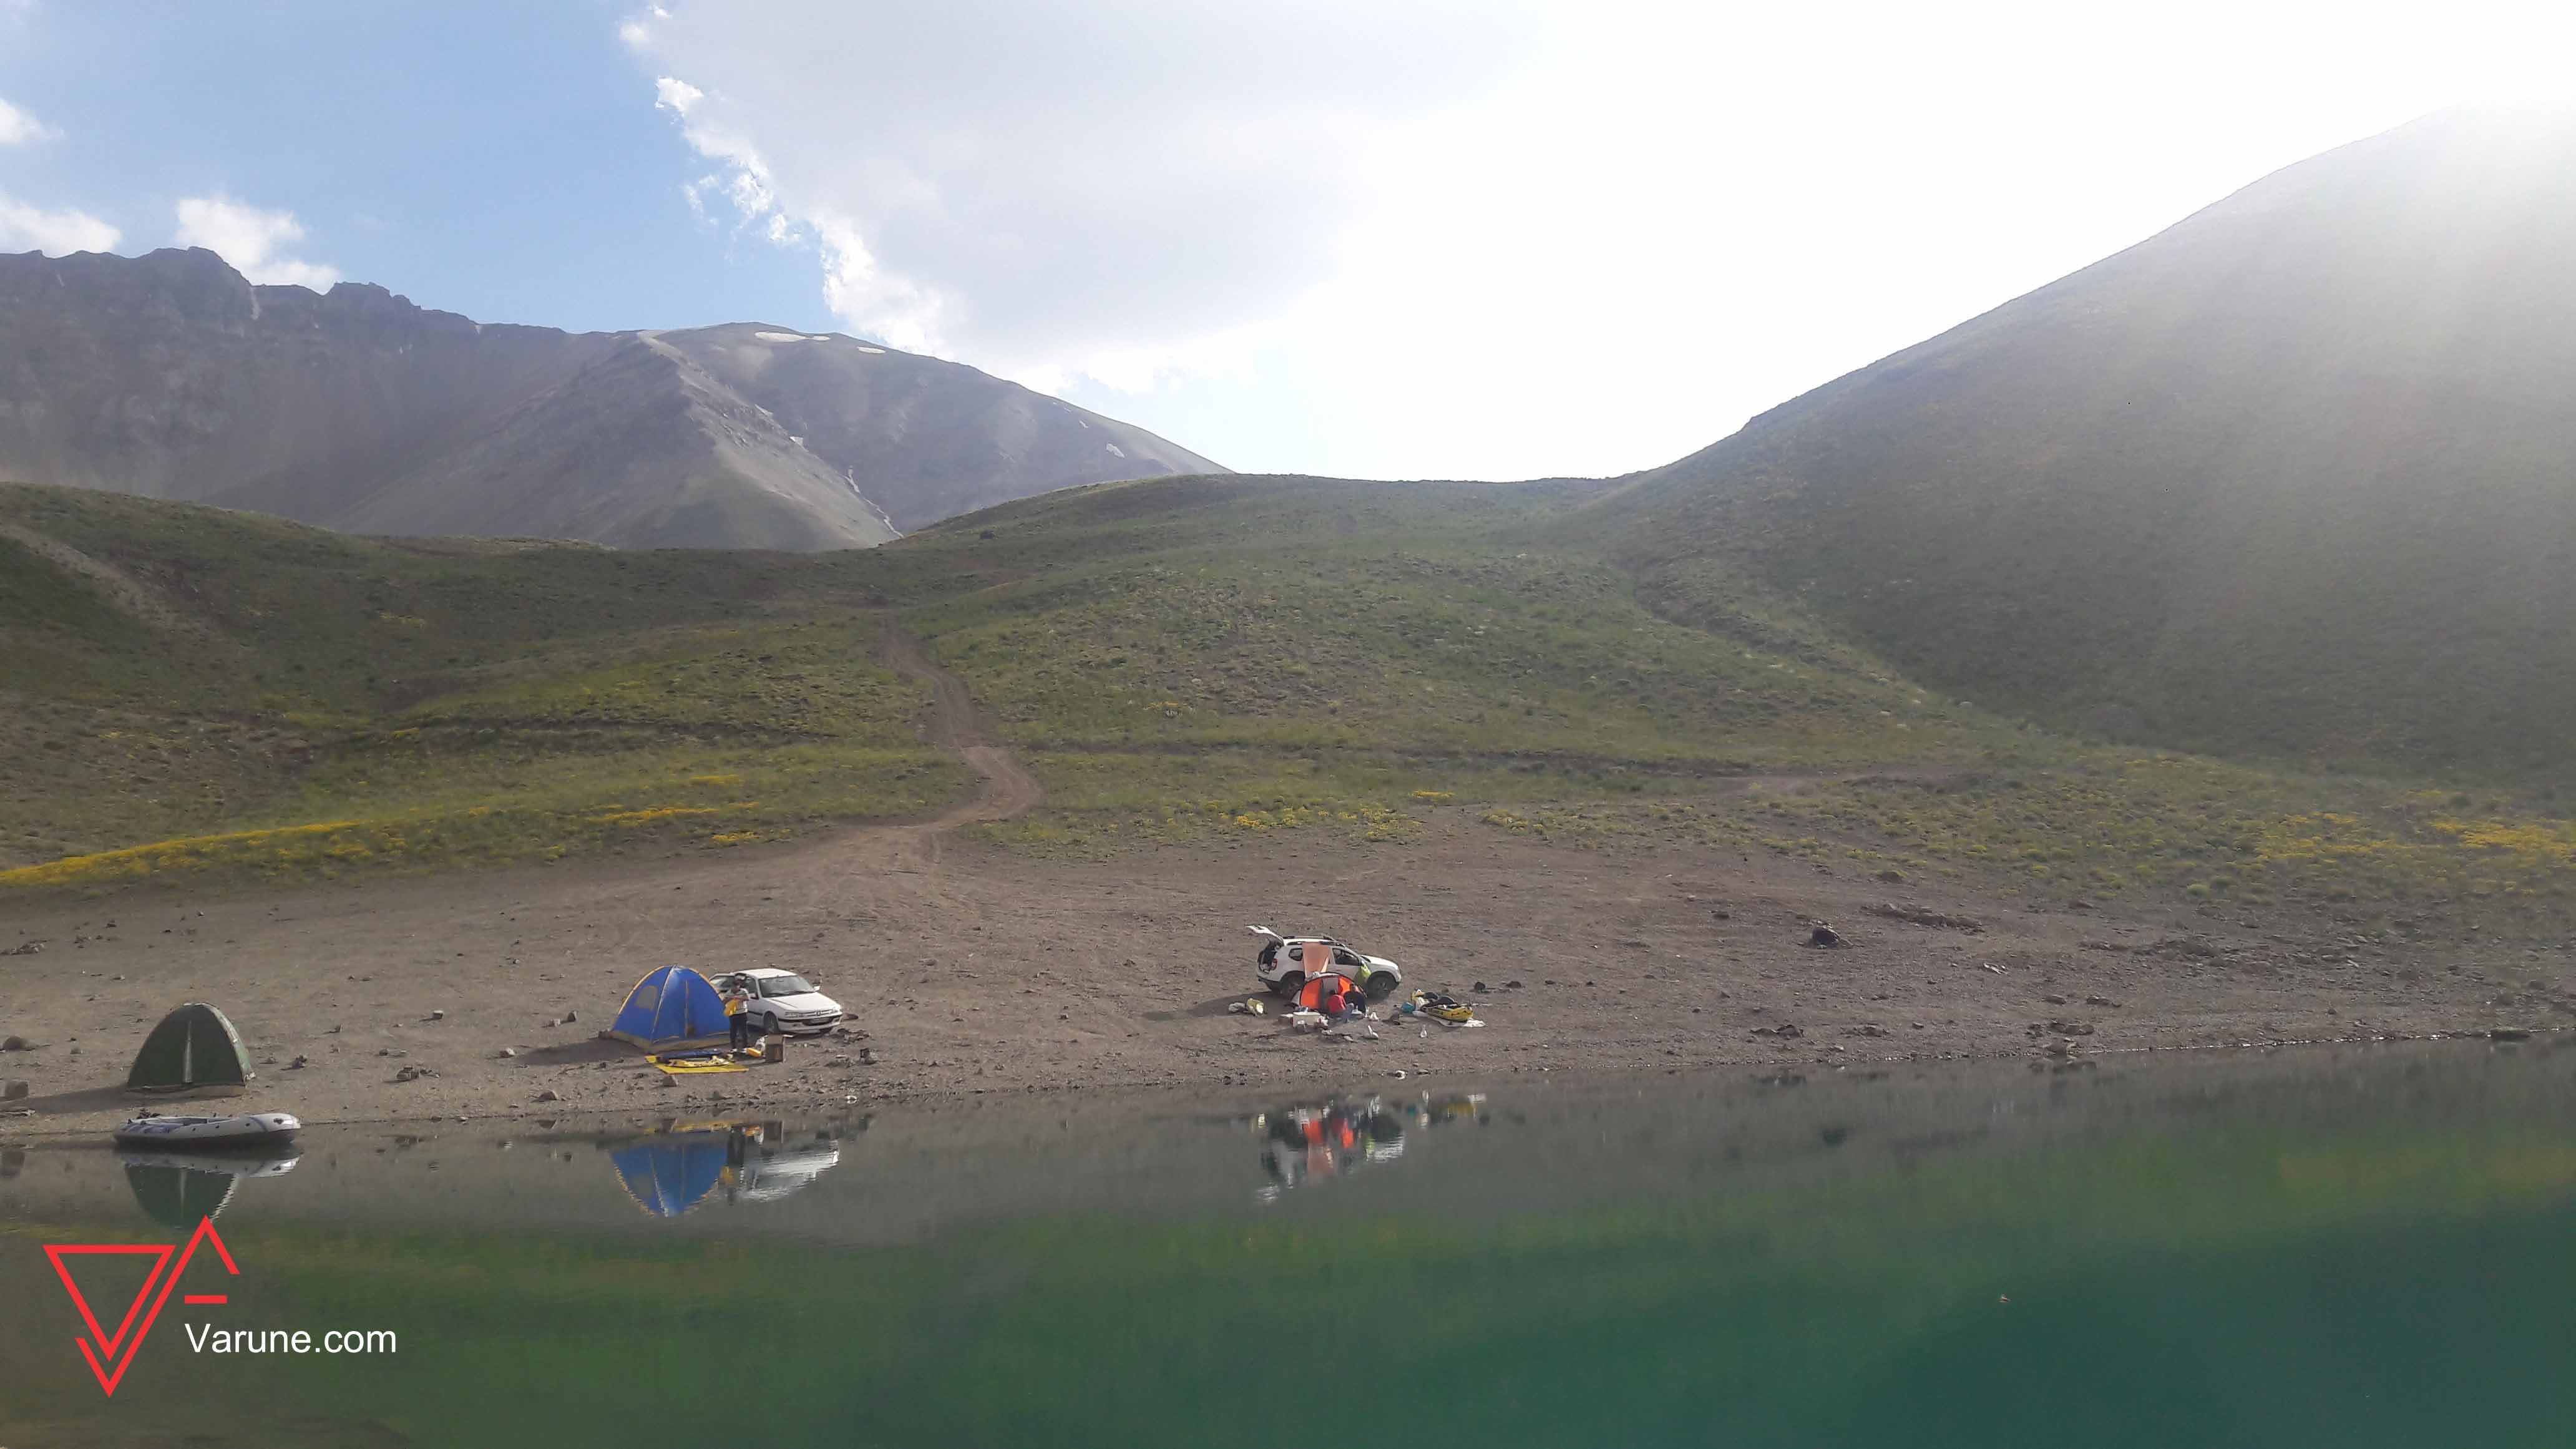 گزارش برنامه دریاچه تار و هویر